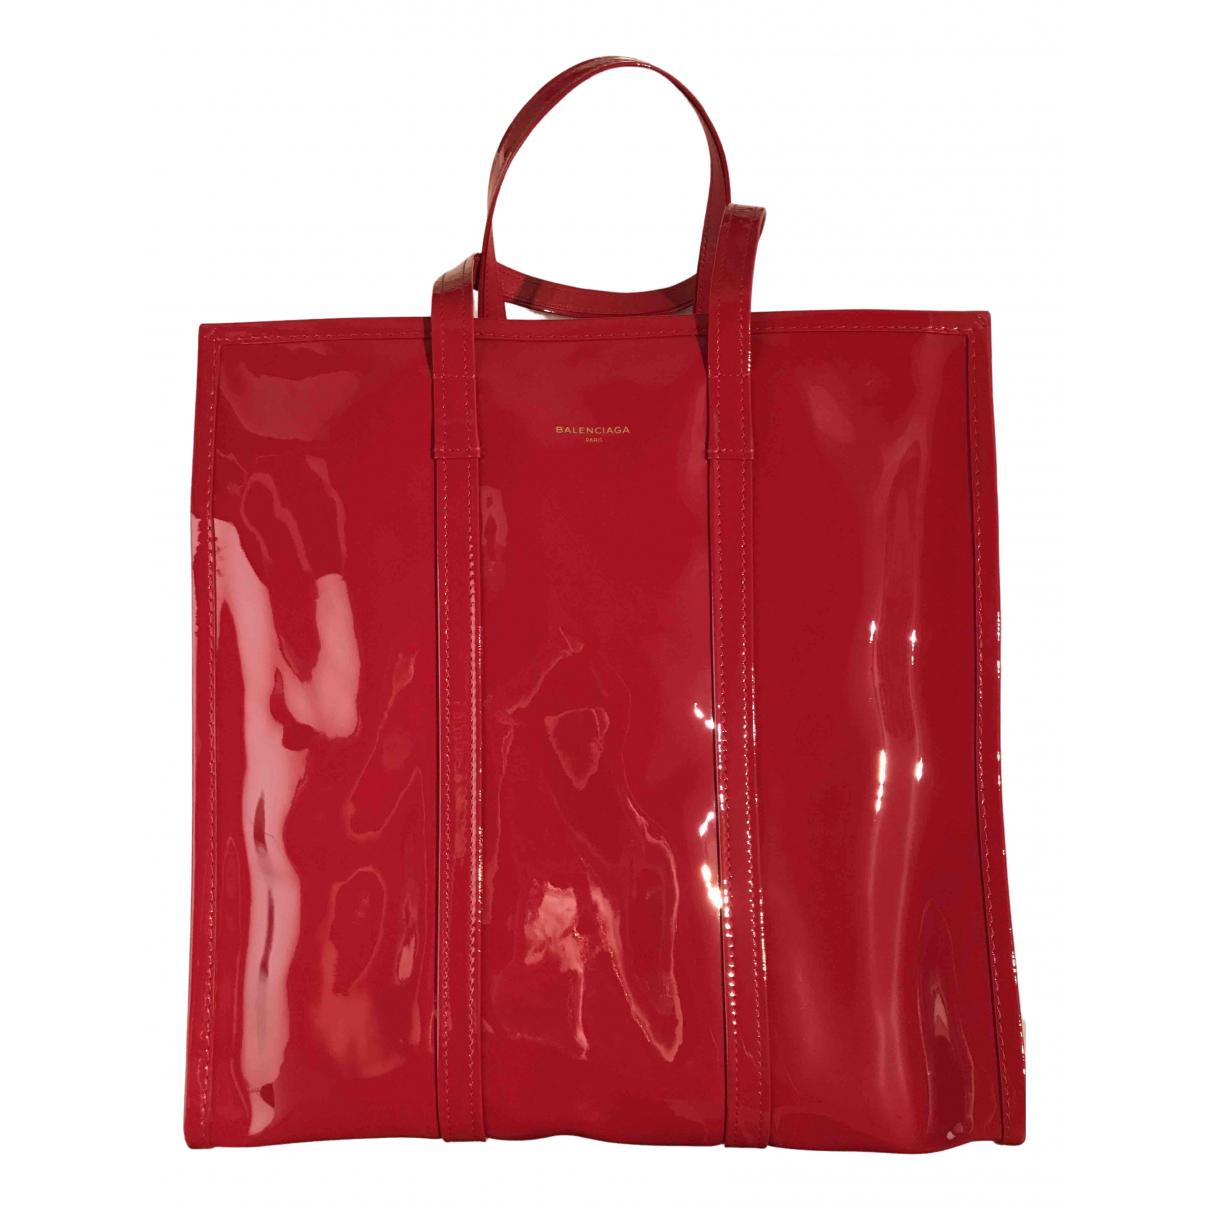 Balenciaga Bazar Bag Red Leather handbag for Women N